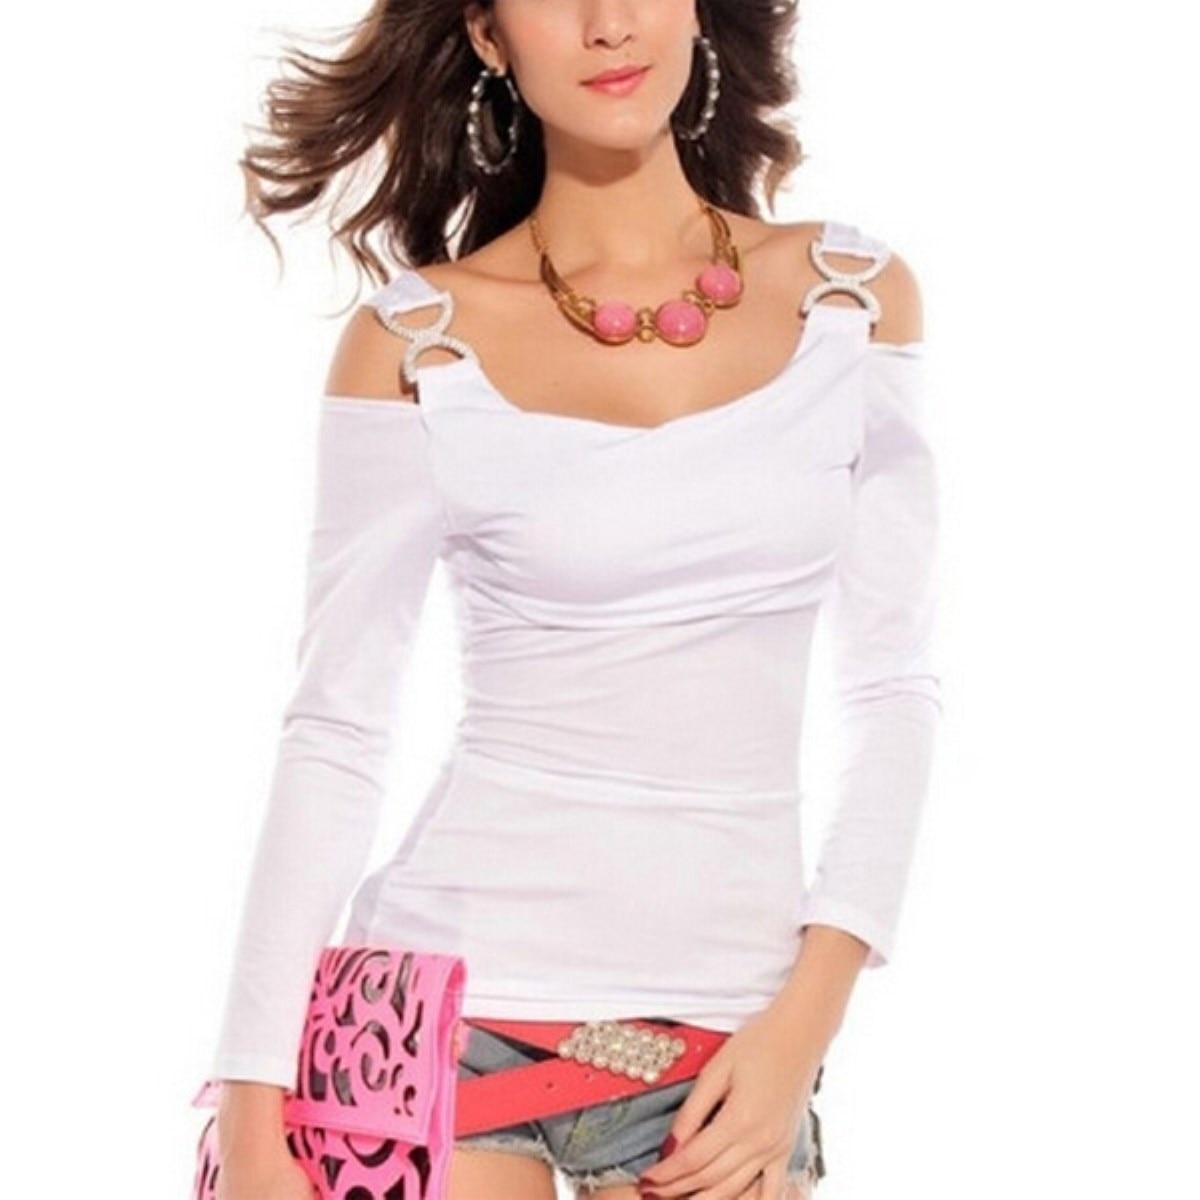 db60958bdbd01 ZANZEA Women T shirt Sexy Off Shoulder Tops Long Sleeve T Shirts 2018  Summer Autumn Slim Fit Casual Tee Buckless Blusa Plus Size-in T-Shirts from  Women s ...